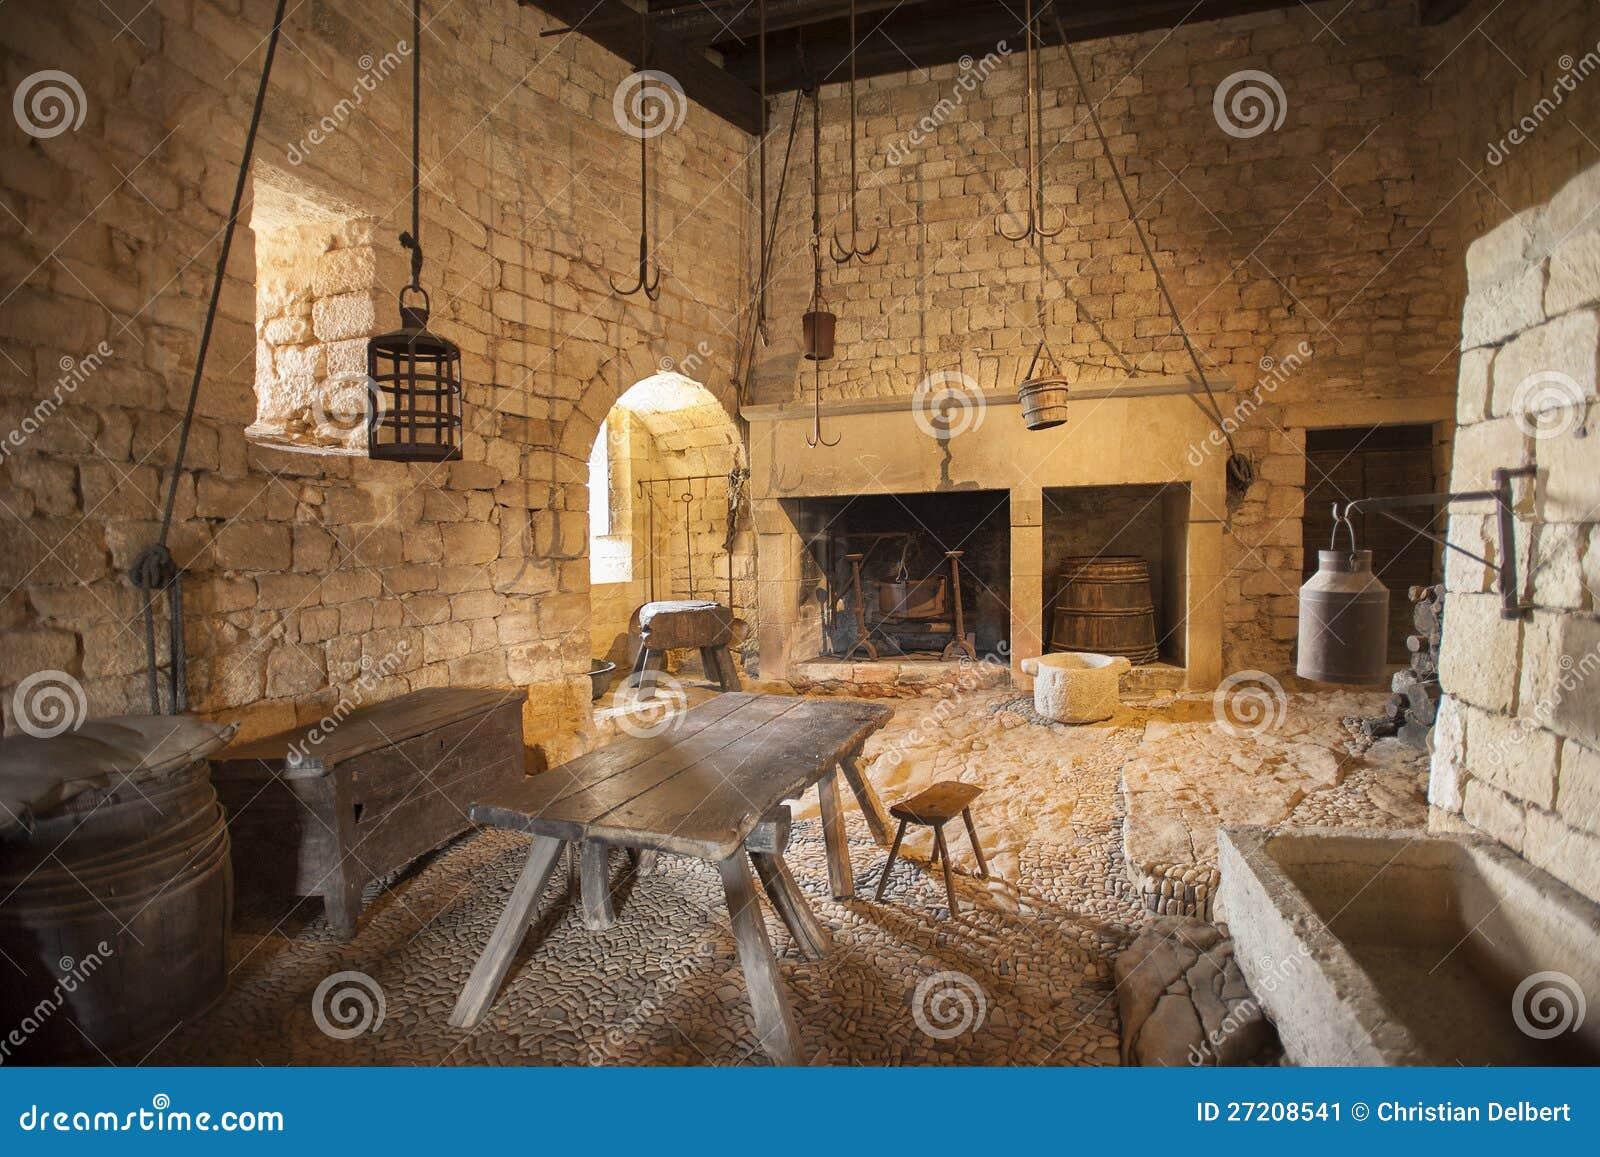 cuisine m di vale image stock image 27208541. Black Bedroom Furniture Sets. Home Design Ideas